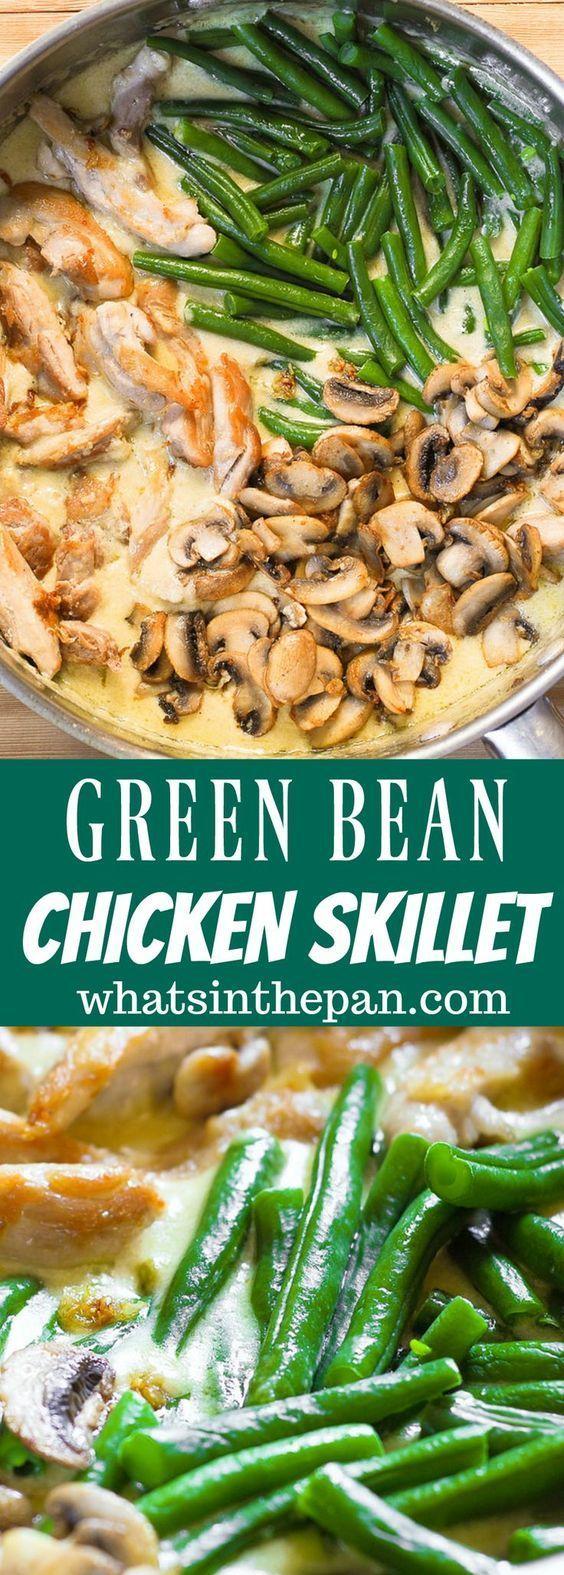 Chicken Creamy Sauce with Green Beans Mushroom